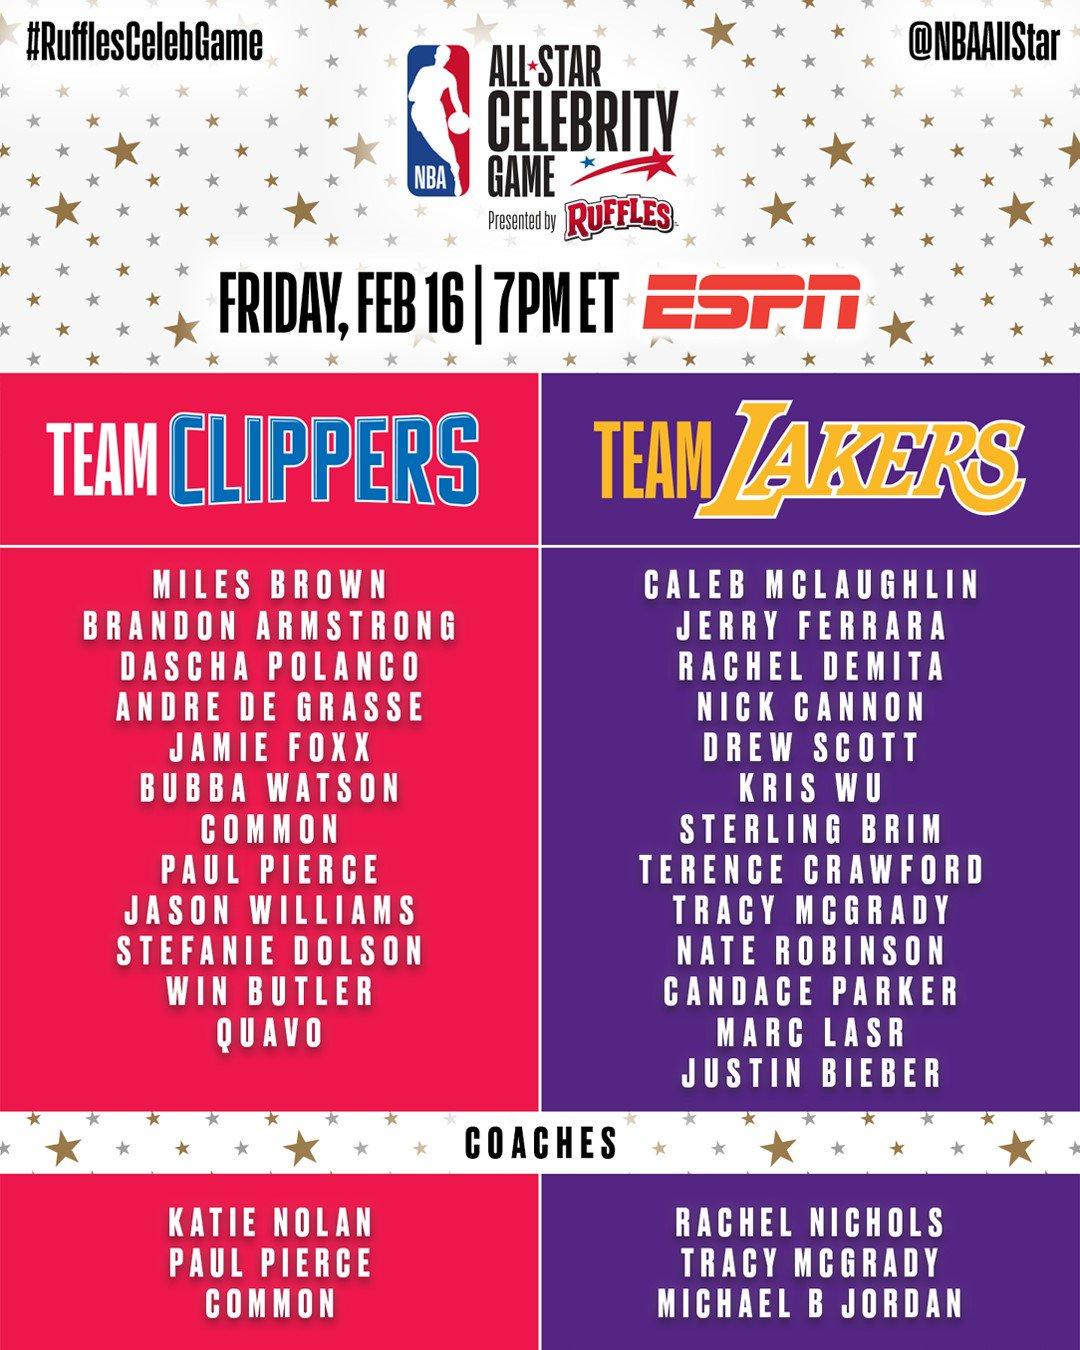 Warriors Game Live Stream Free Espn: Nba Celebrity Game 2018 Live Stream Reddit